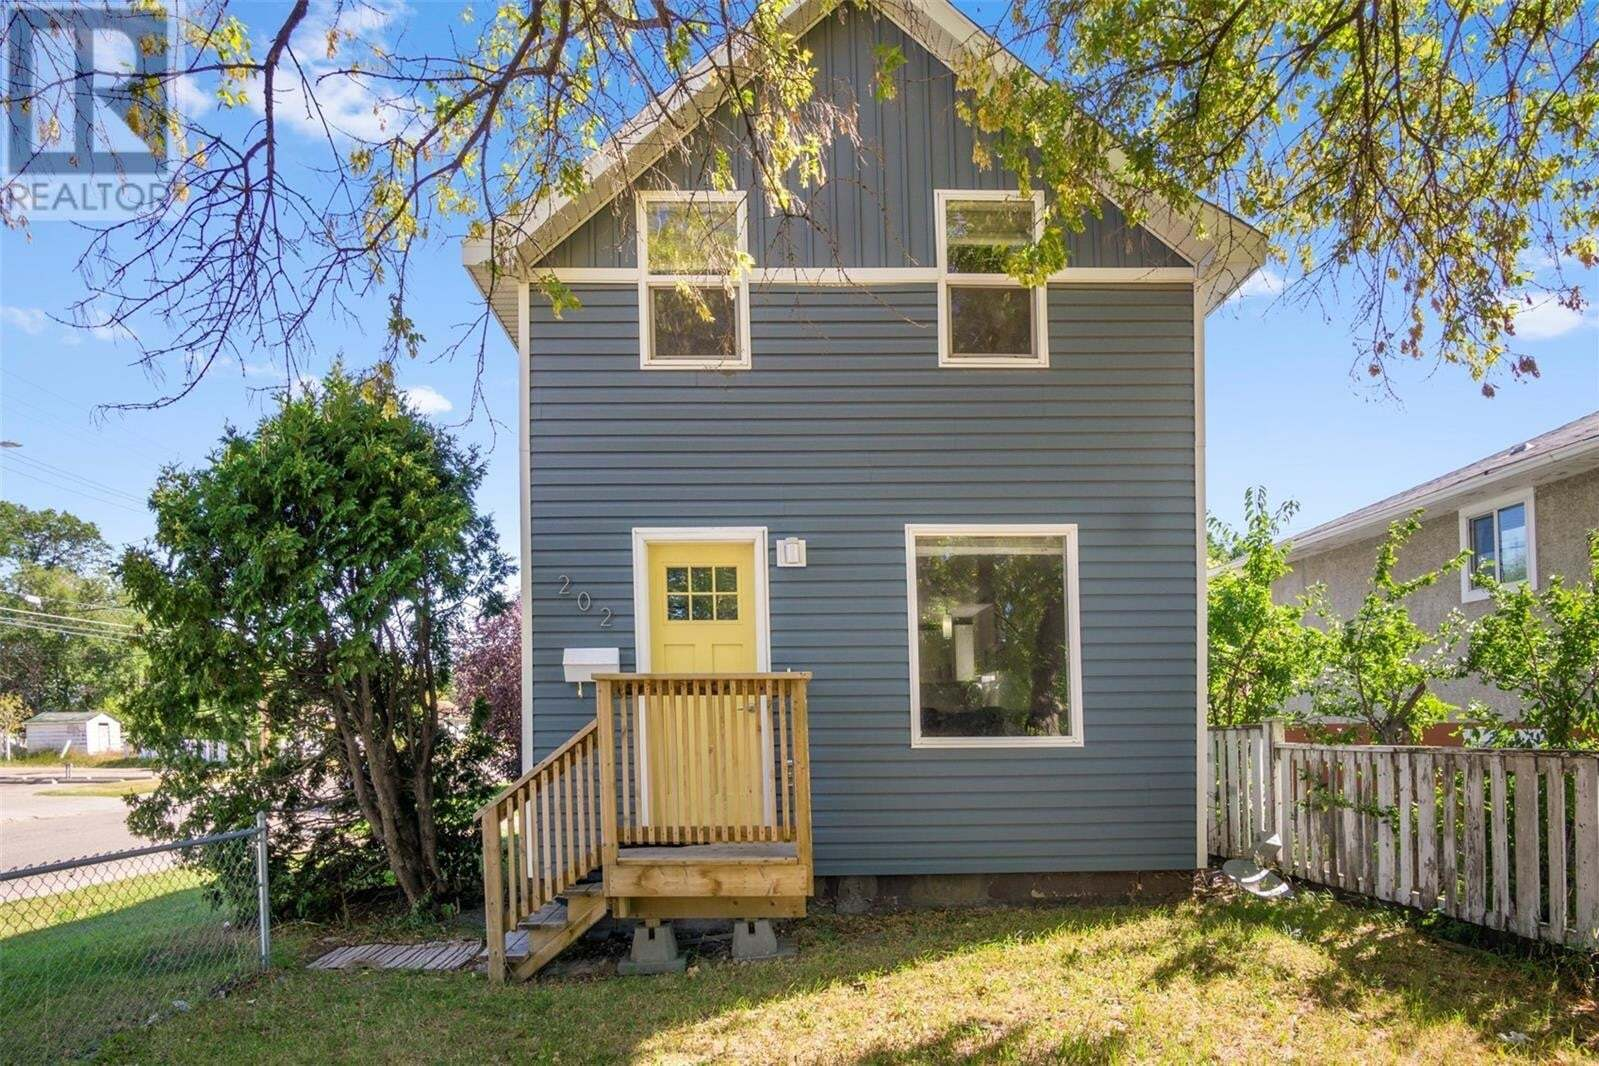 House for sale at 202 W Ave S Saskatoon Saskatchewan - MLS: SK825730